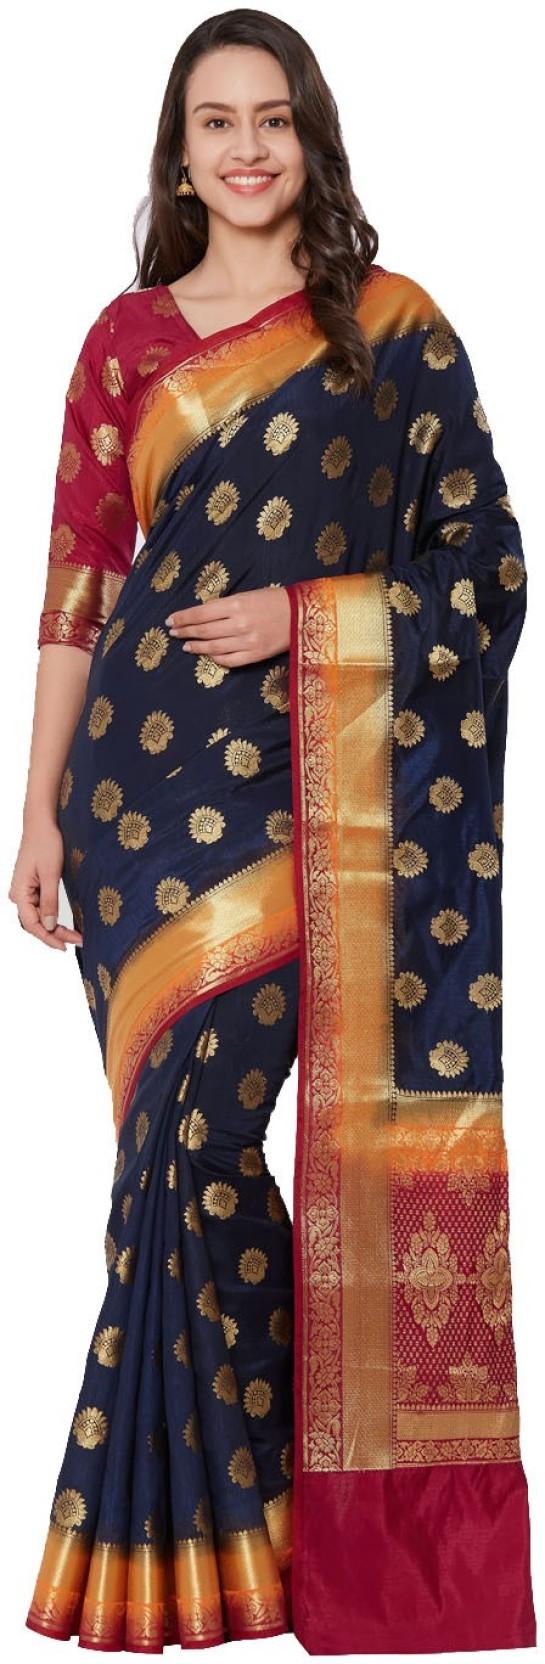 14881517f1db57 Buy Viva N Diva Woven Banarasi Banarasi Silk Blue Sarees Online ...